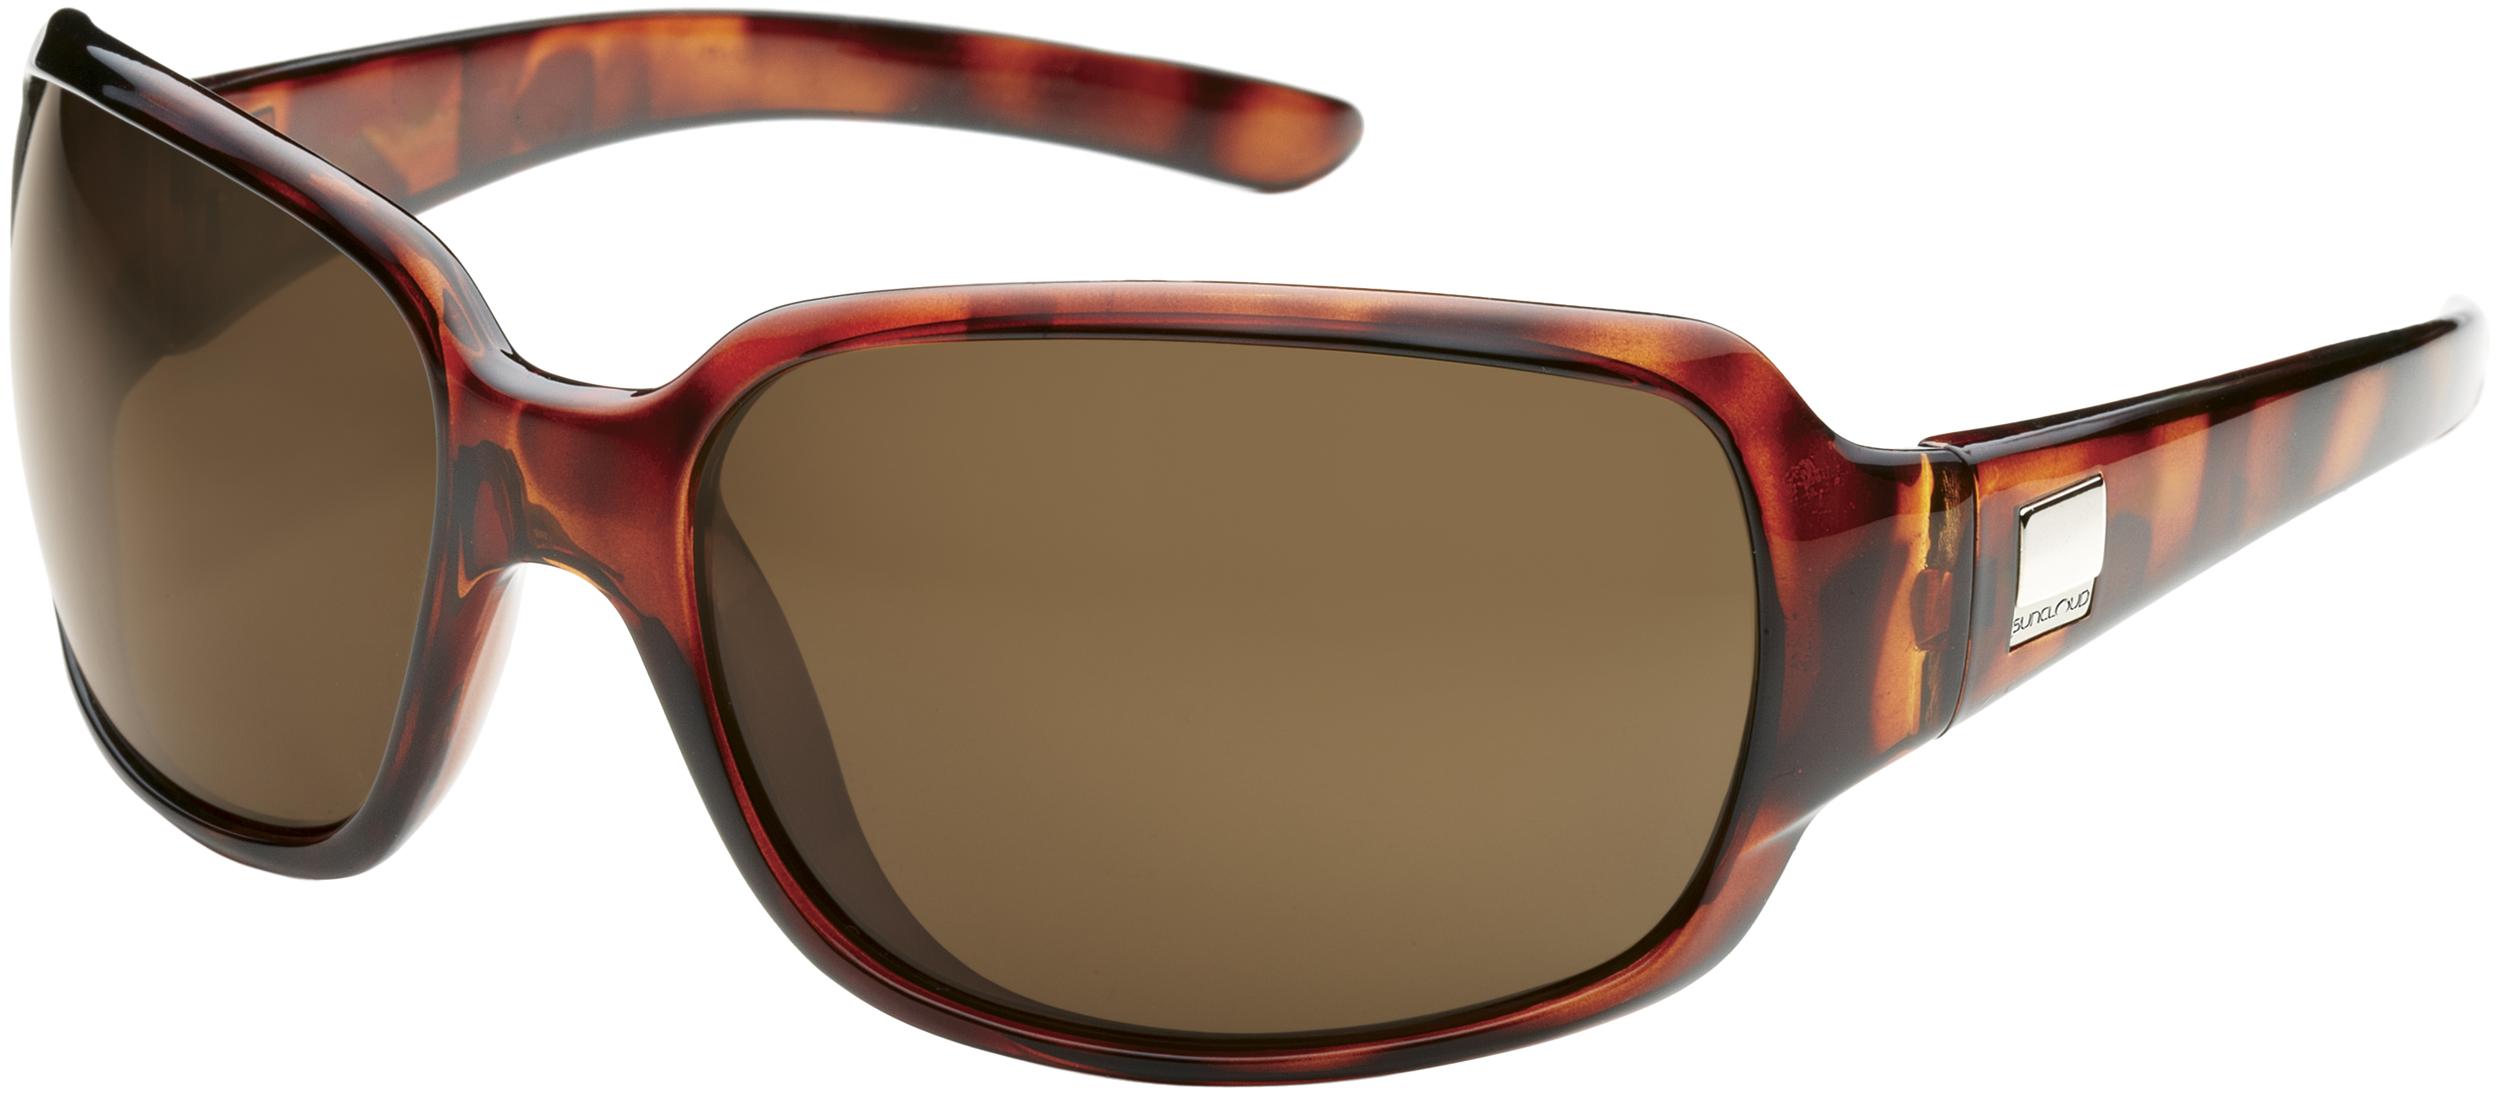 da45742466b Suncloud Cookie Polarized Sunglasses - Unisex